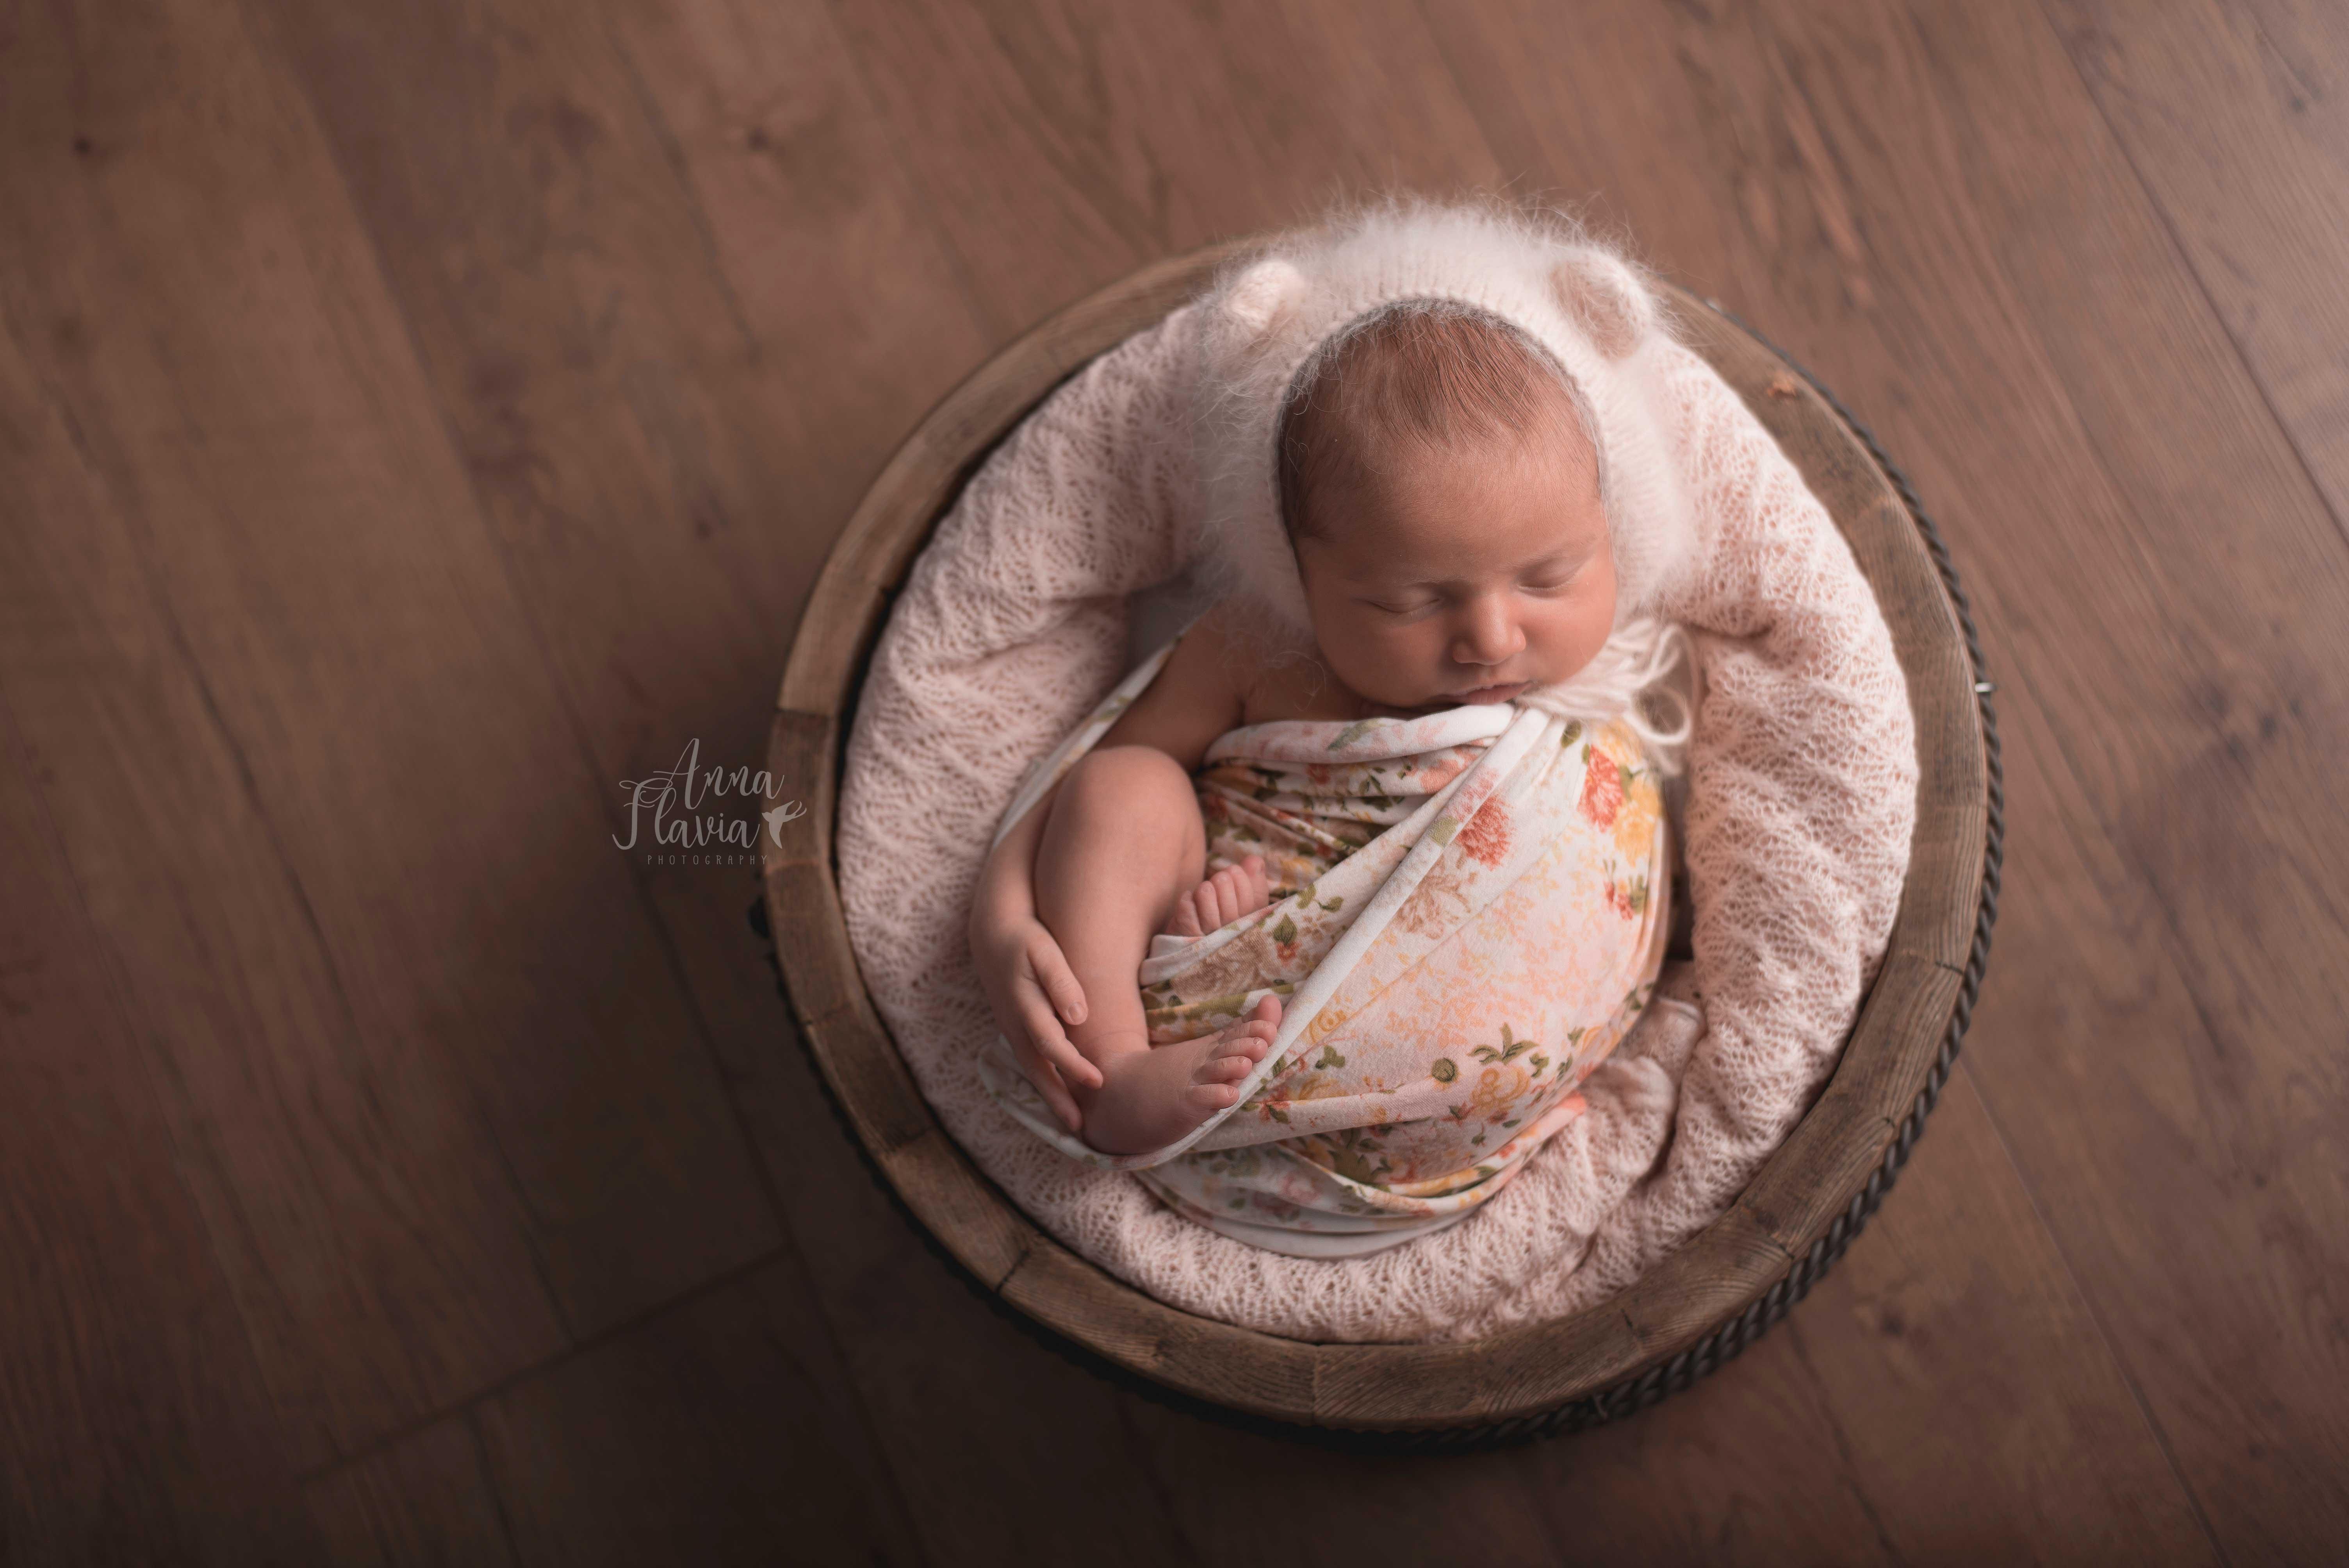 photographer_dublin_anna_flavia_newborn_maternity_28